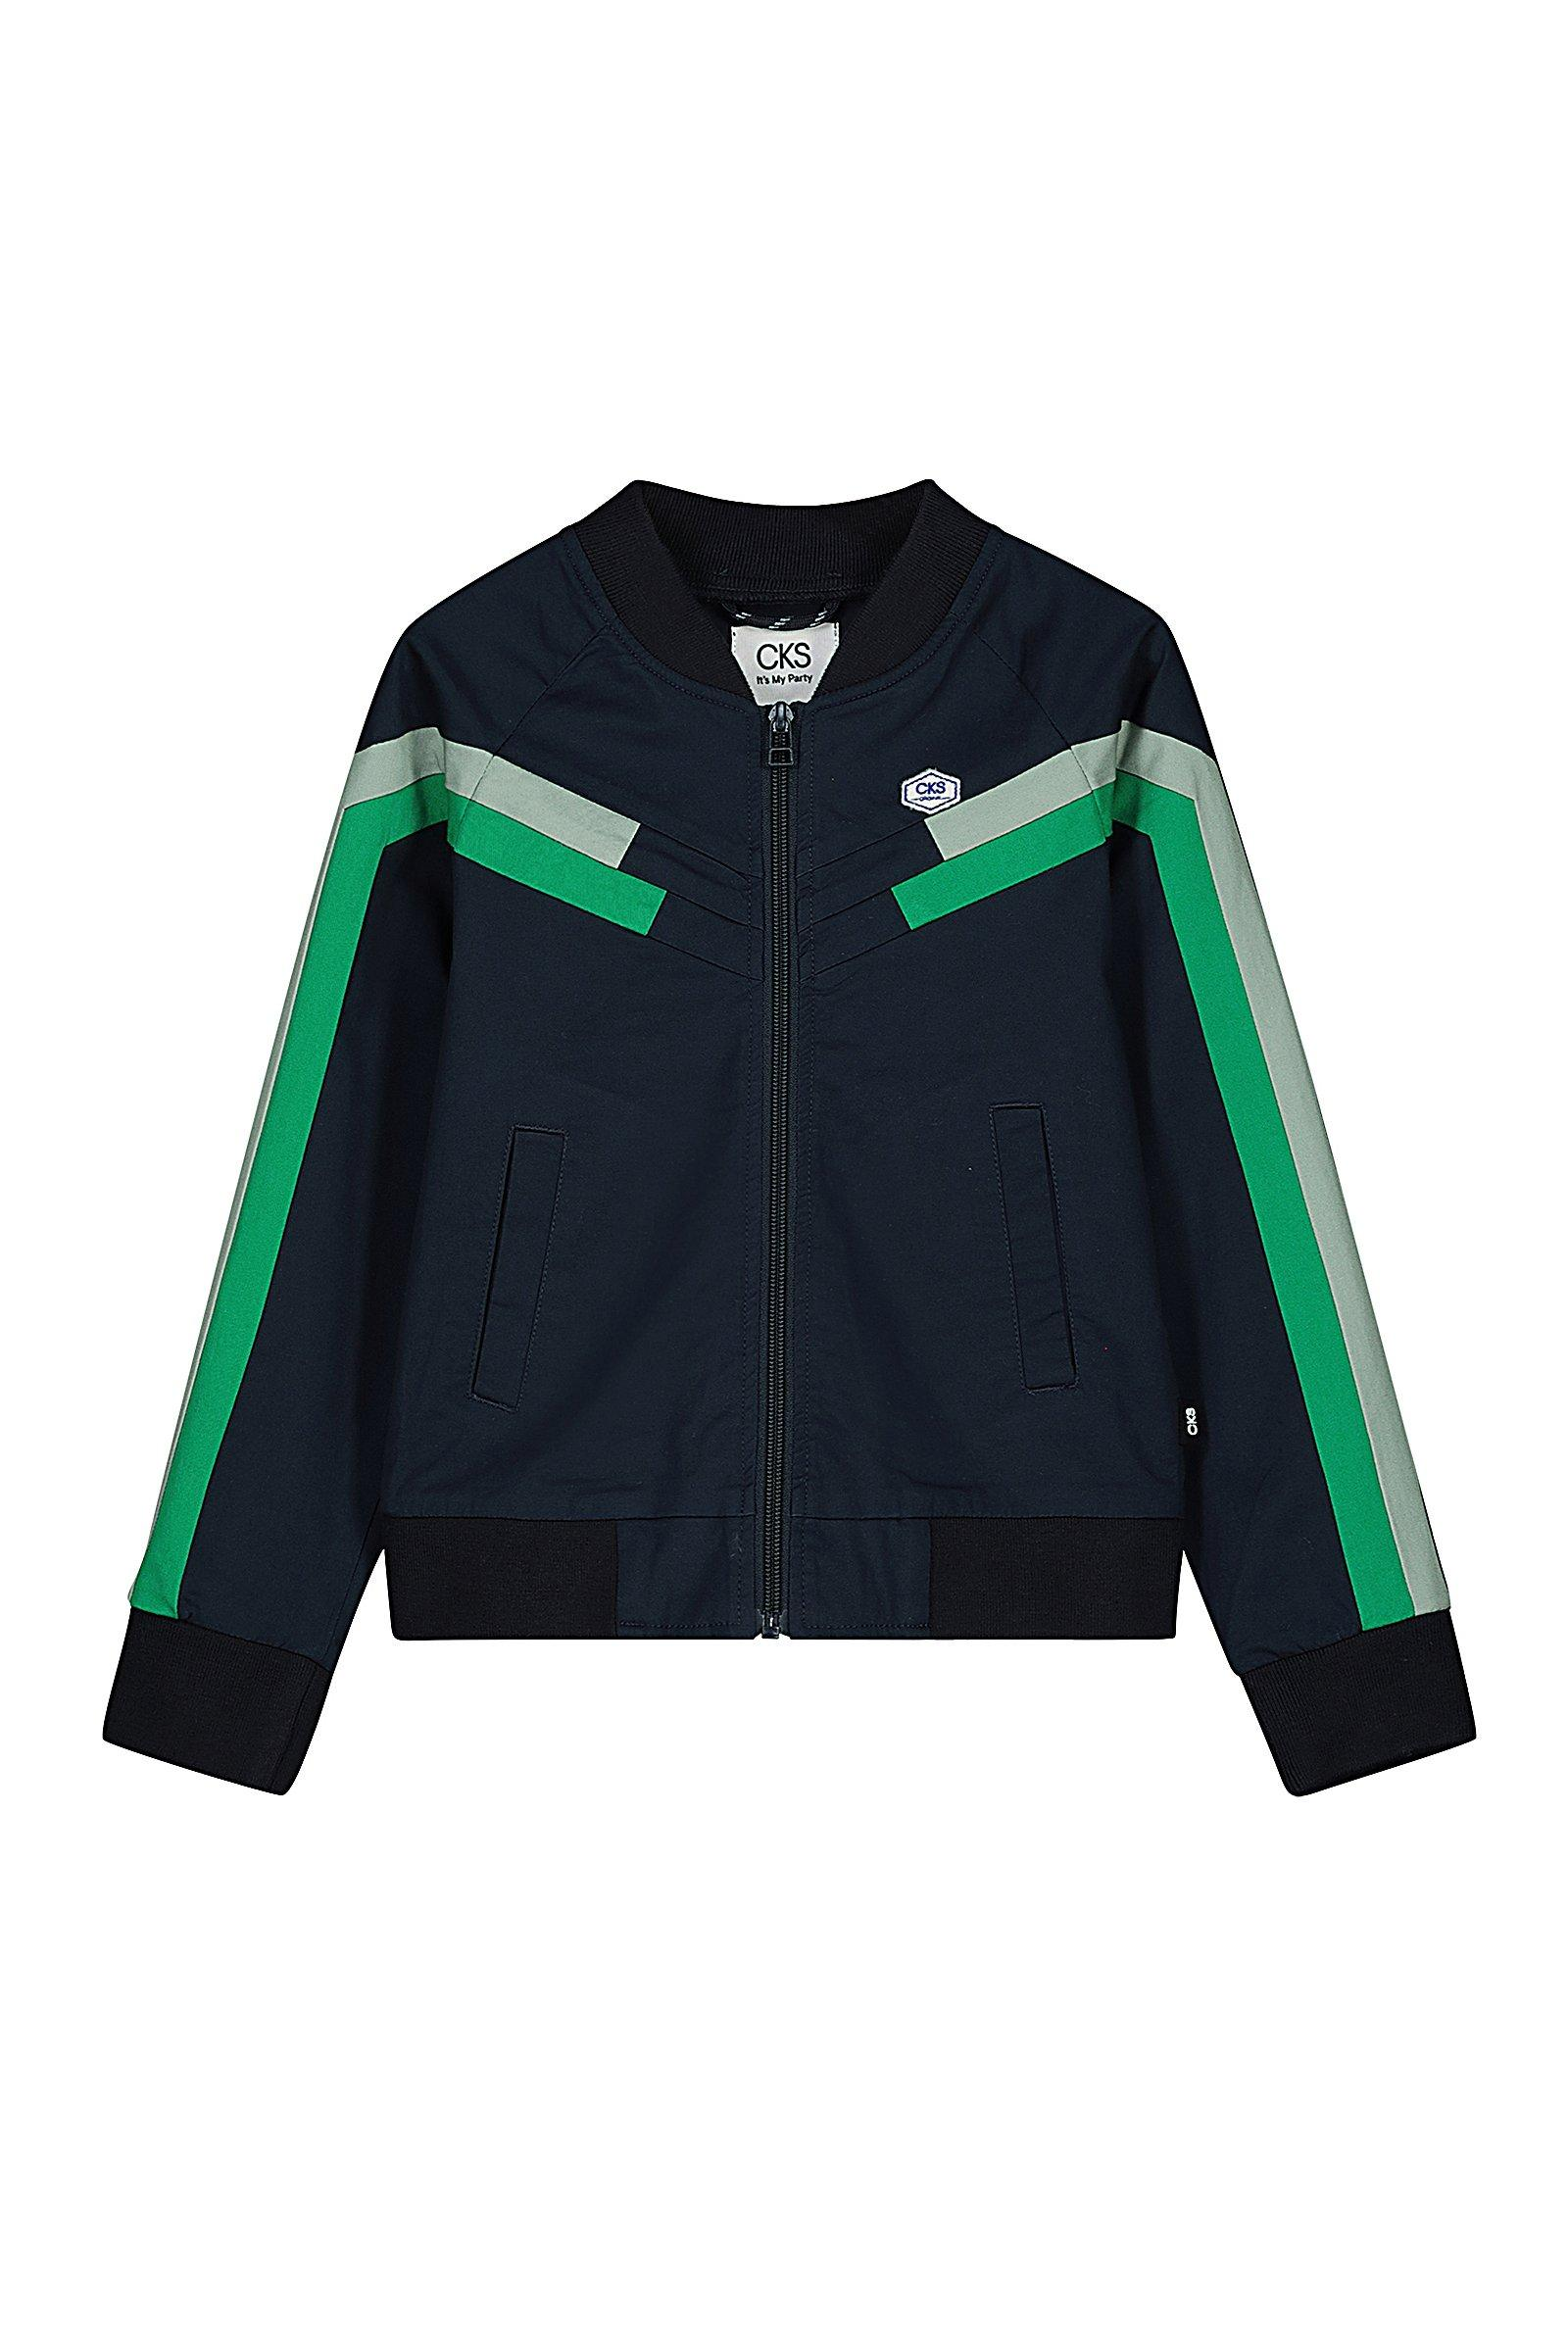 CKS Kids - BURT - korte casual jas - blauw